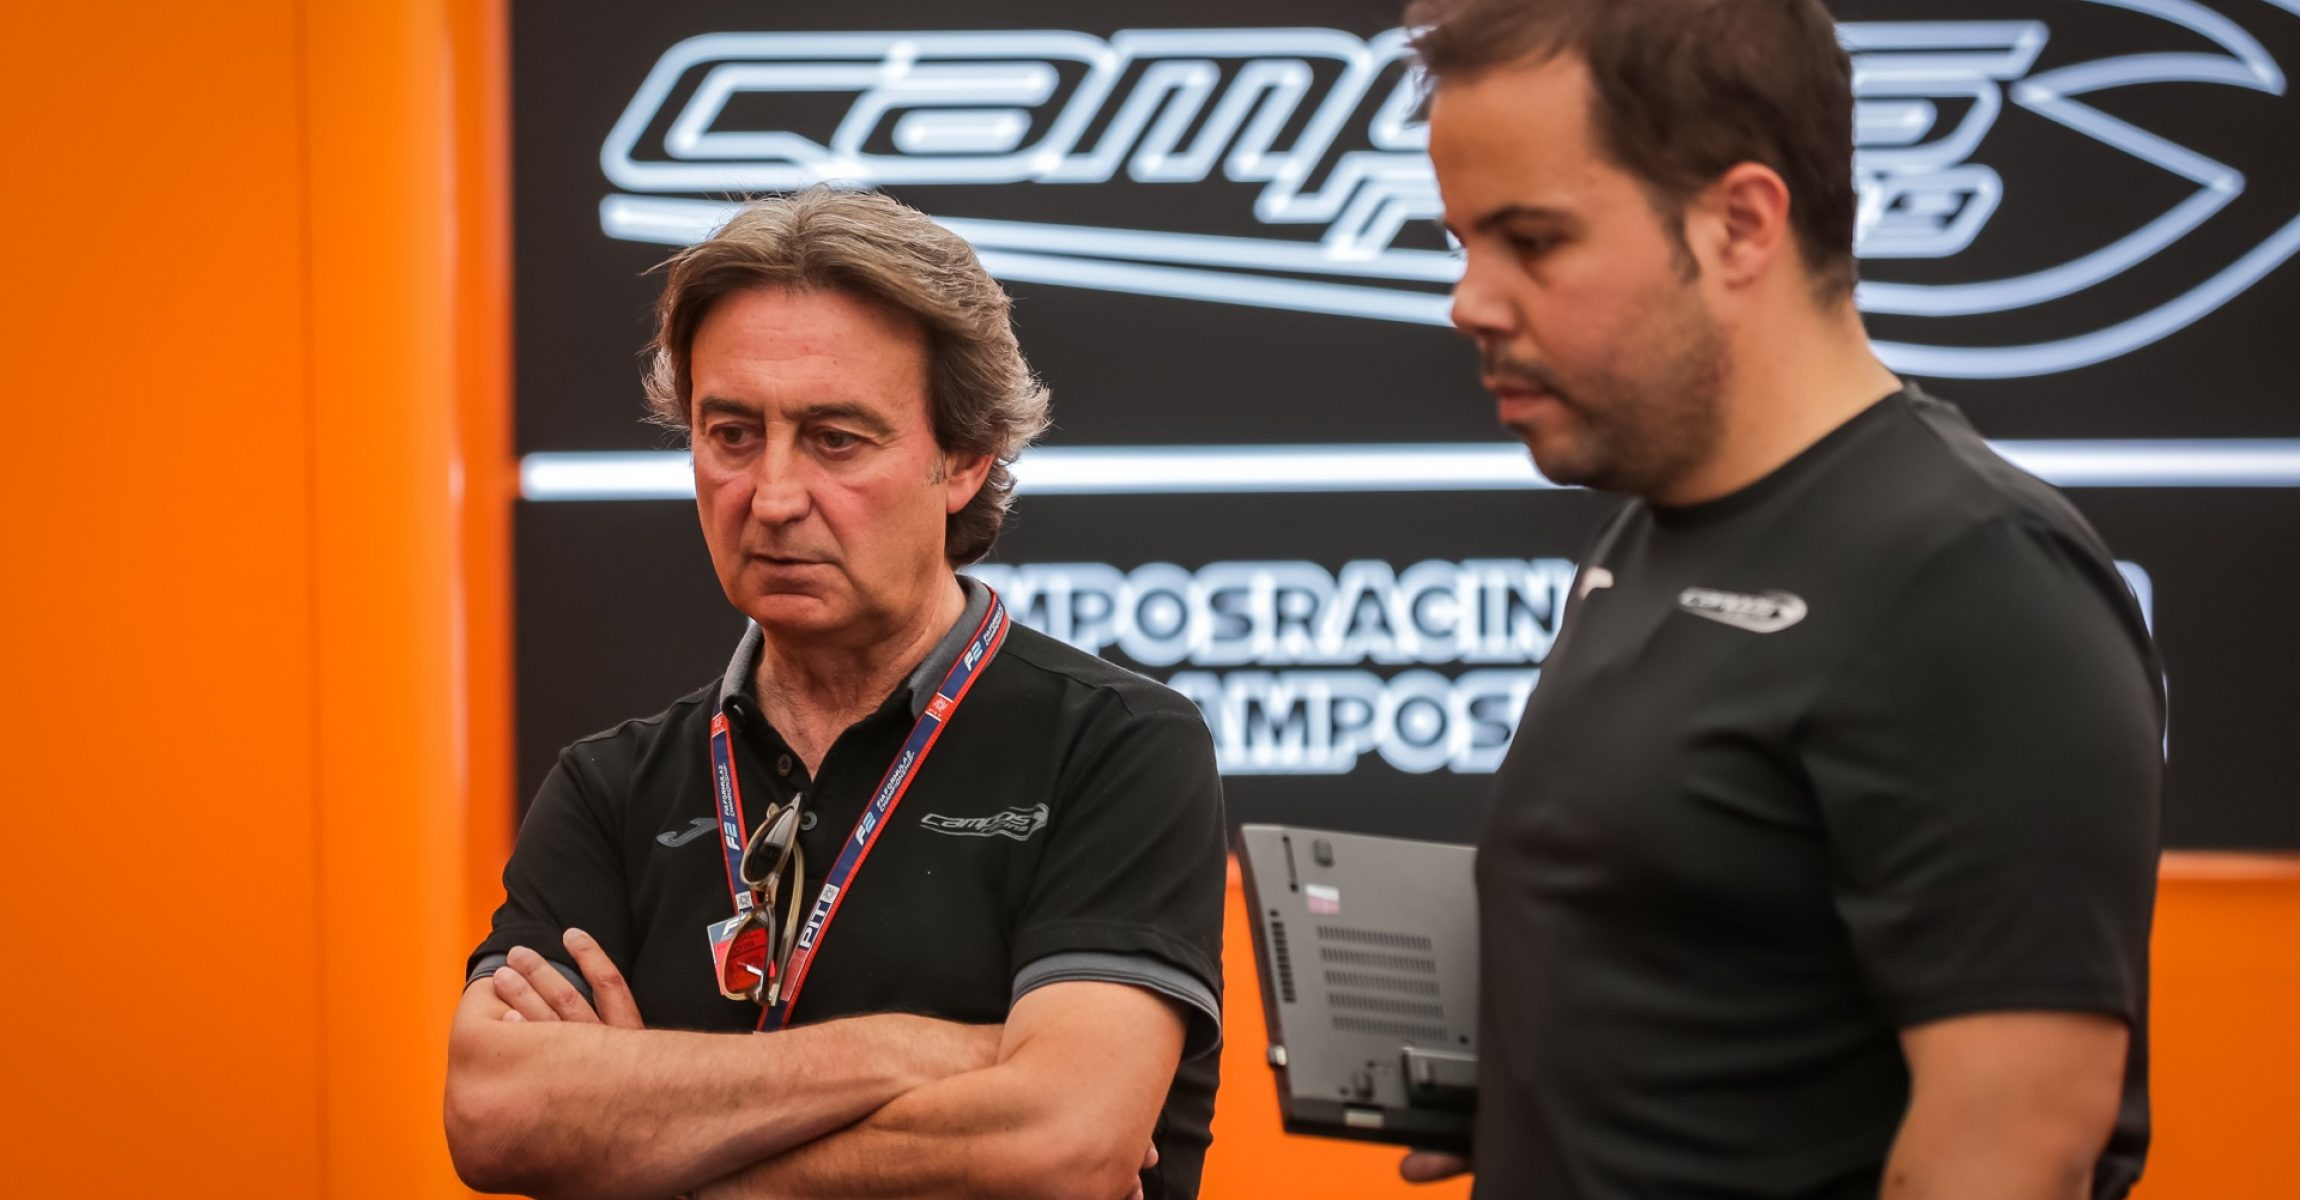 Adrián Campos Spielberg (AUT), JUN 27-30 2019 - Austrian Grand Prix at the Red Bull Ring. Campos Racing. © 2019 Sebastiaan Rozendaal / Dutch Photo Agency